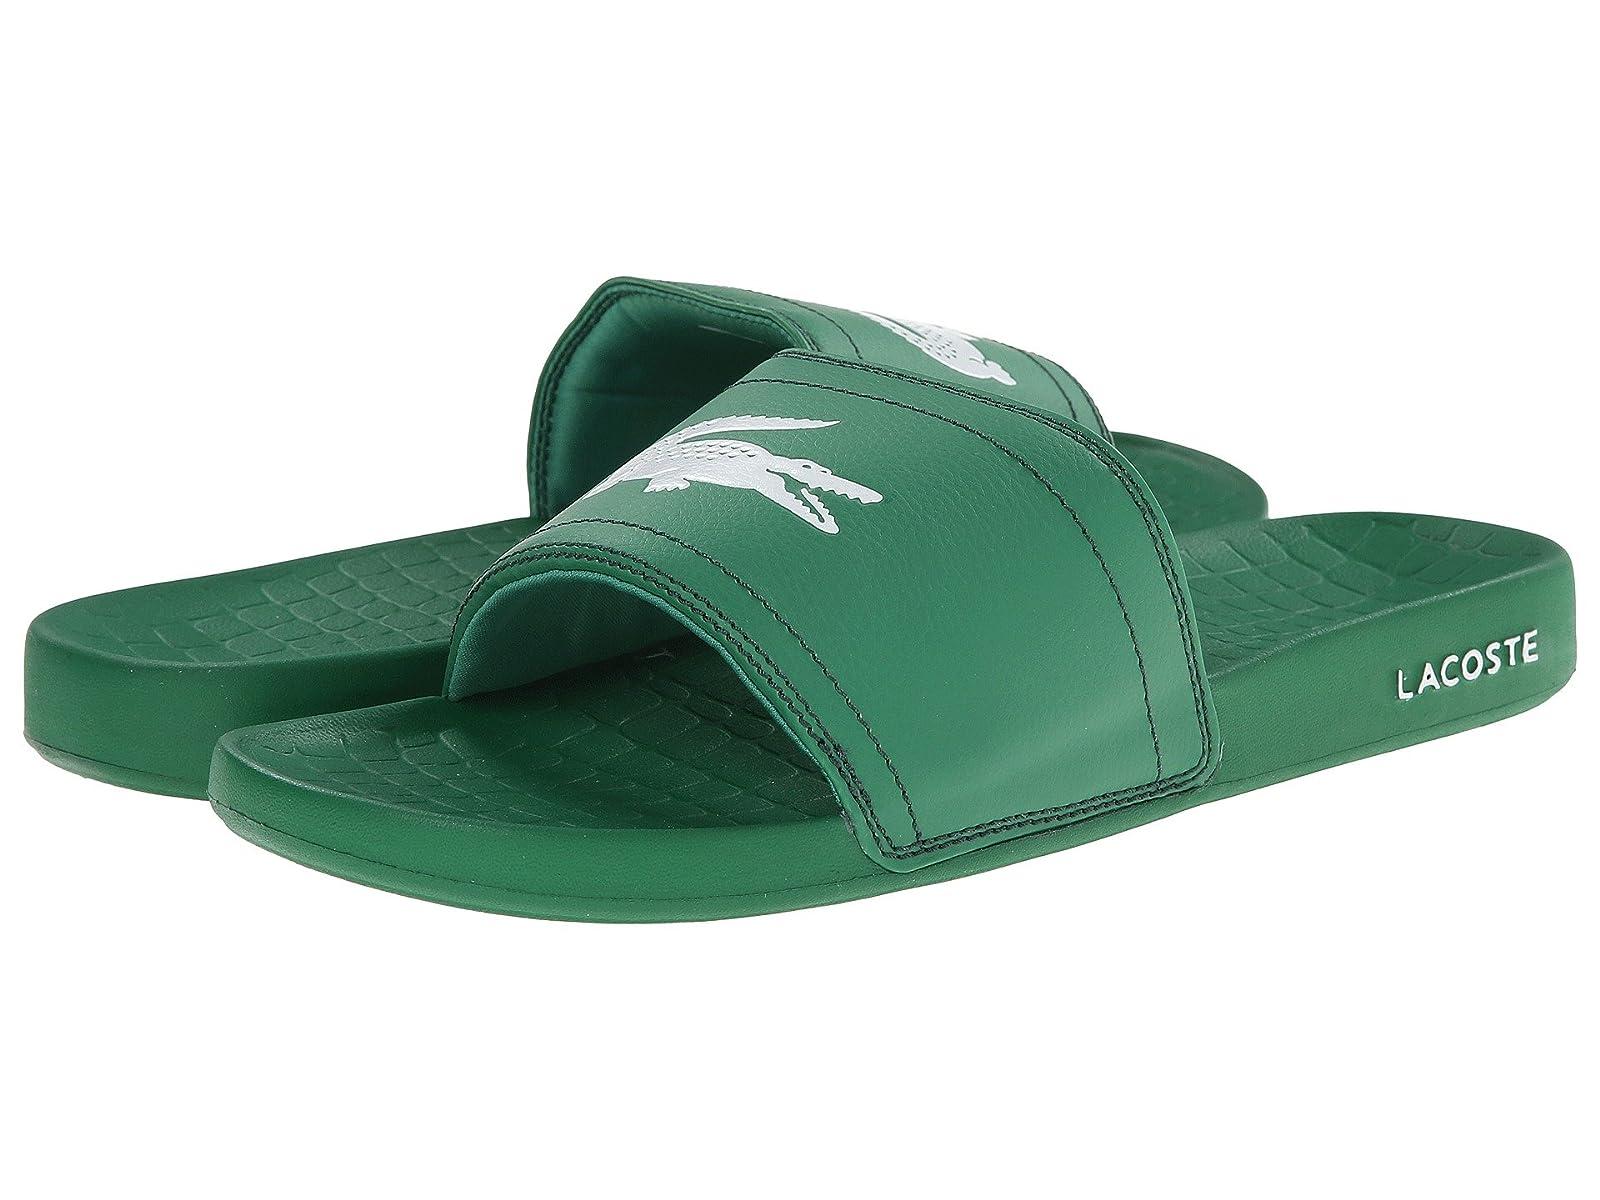 Lacoste Fraisier Brd1Atmospheric grades have affordable shoes